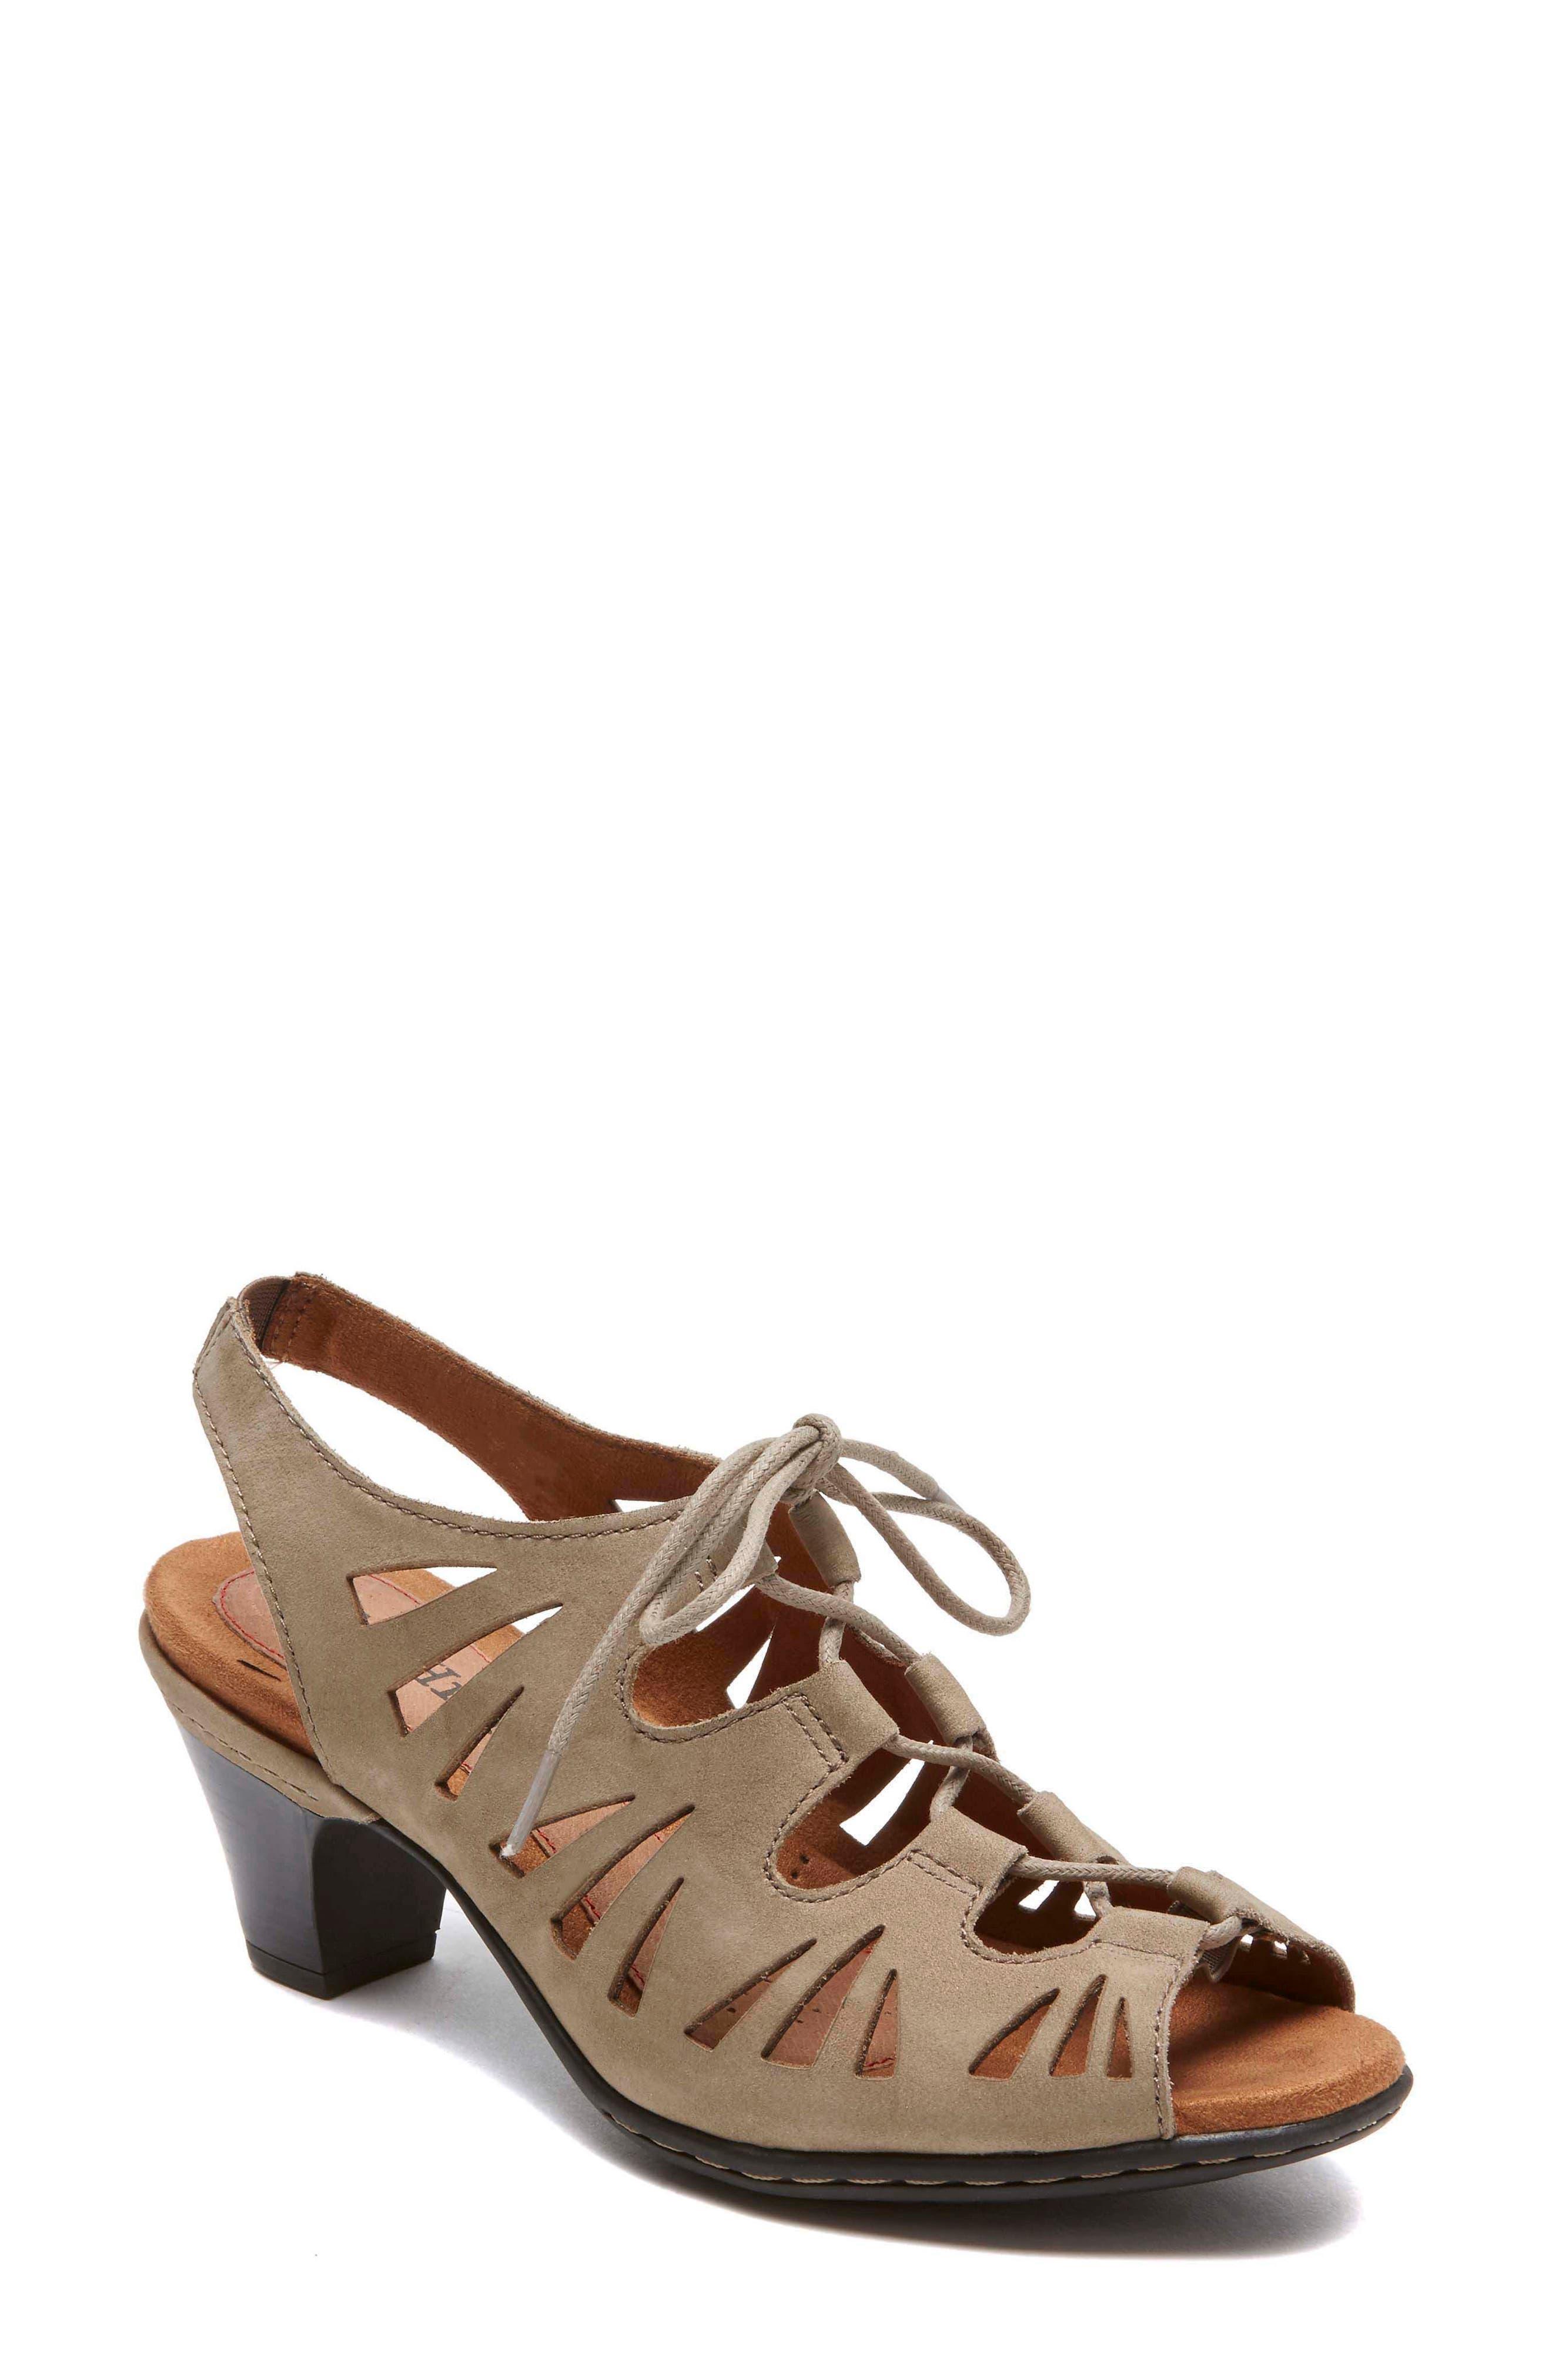 Cobb Hill 'Sasha' Caged Leather Peep Toe Sandal,                             Main thumbnail 1, color,                             KHAKI NUBUCK LEATHER